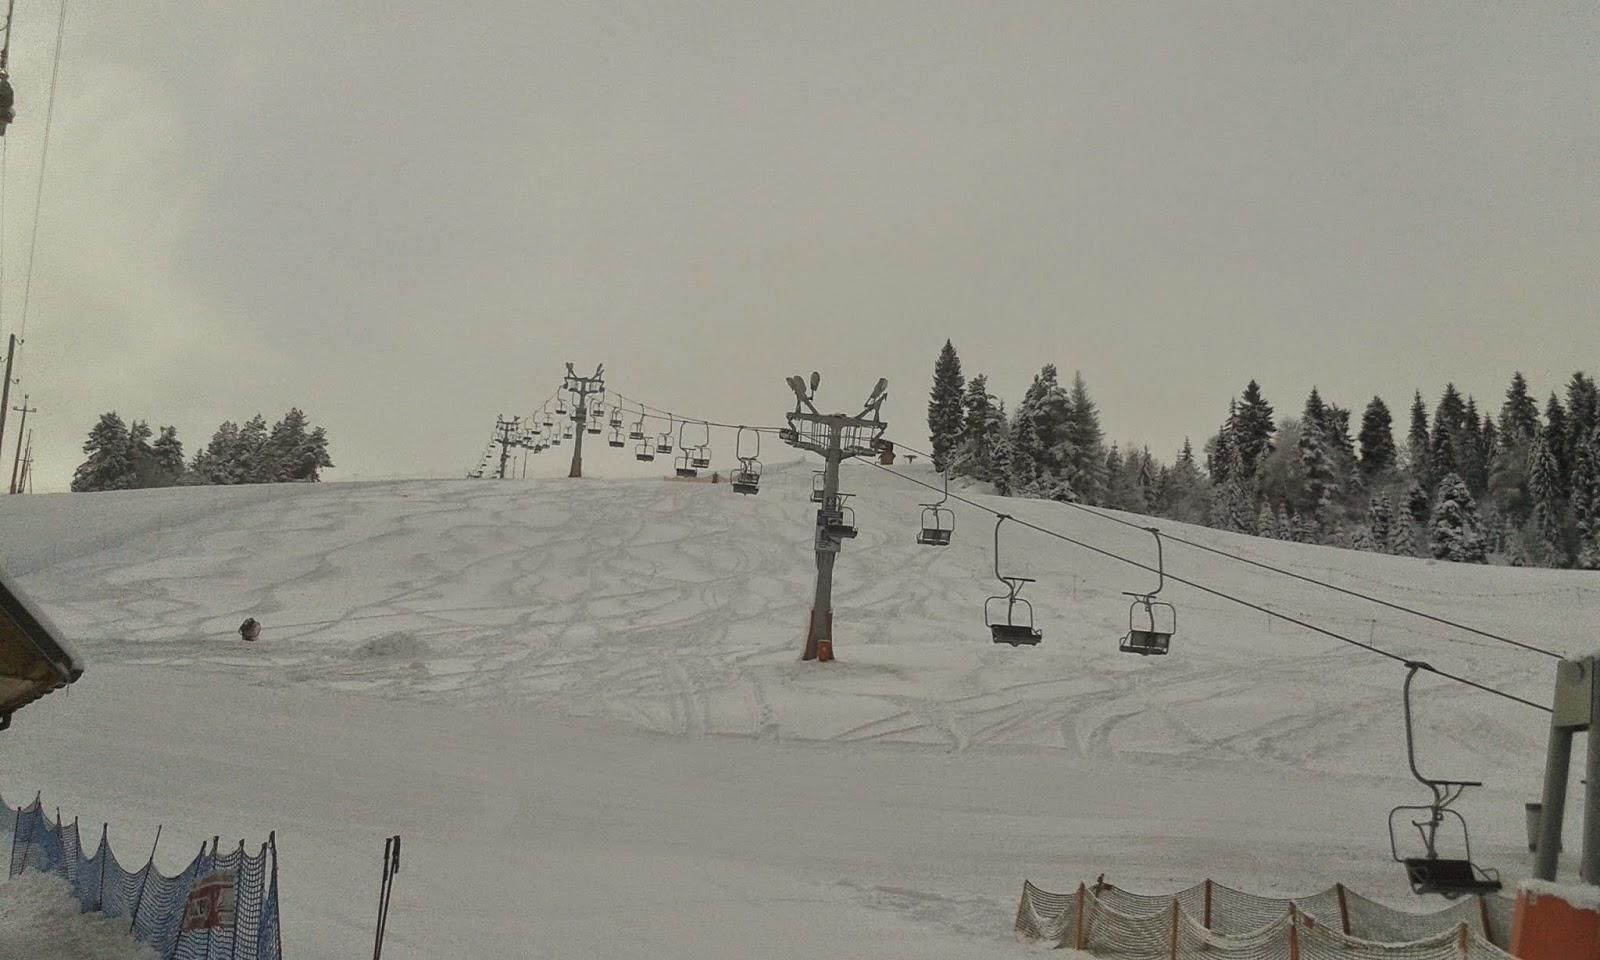 Arena Homole trasa narciarska